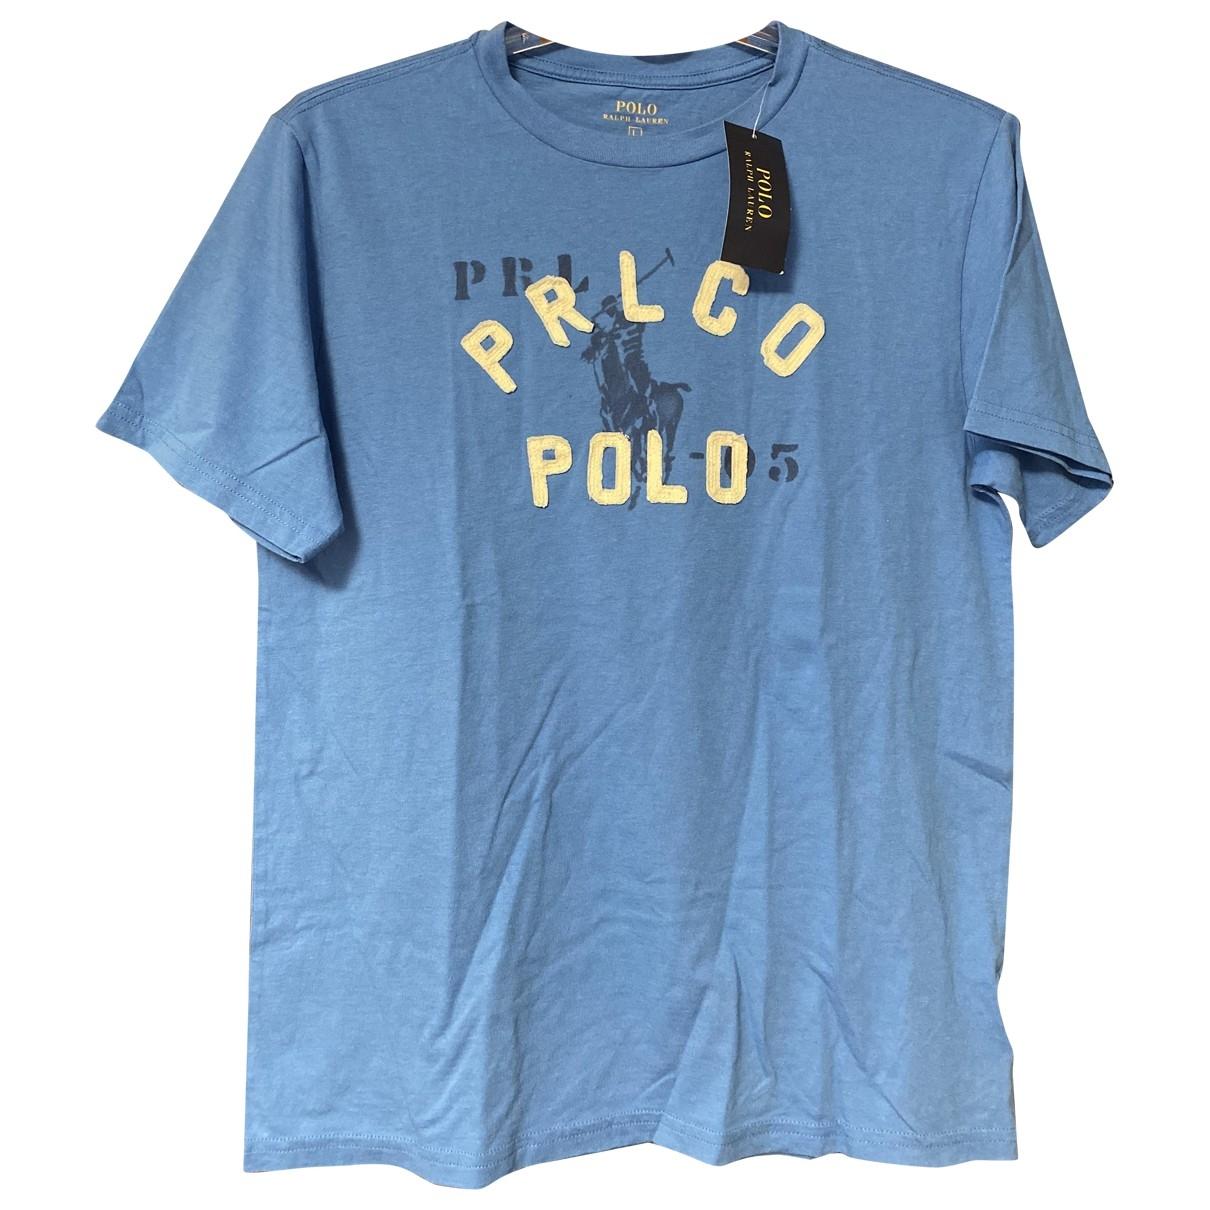 Polo Ralph Lauren - Tee shirts   pour homme en coton - bleu